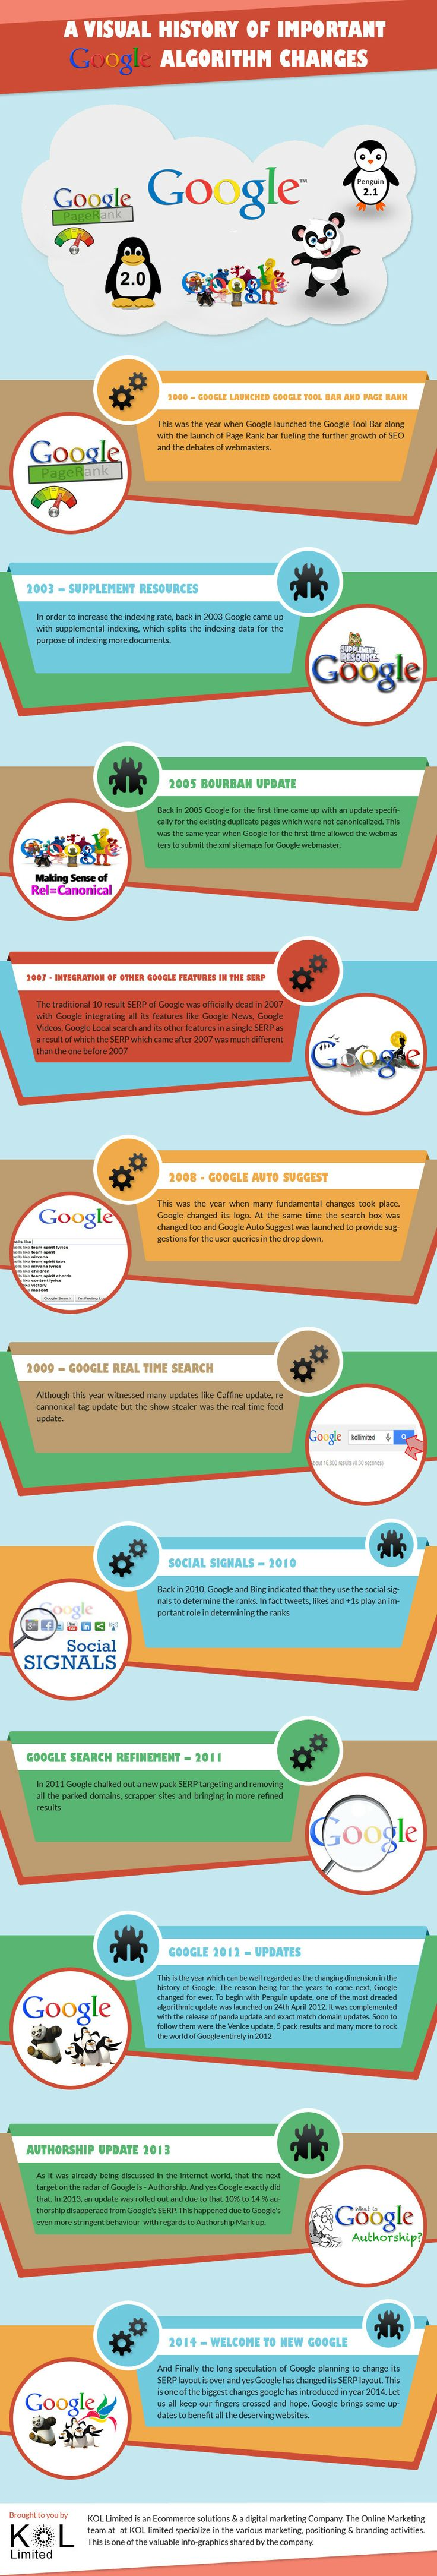 A Visual History Of Important Google Algorithm Changes  04e134fd264ac644dbbd2b8cc736a635